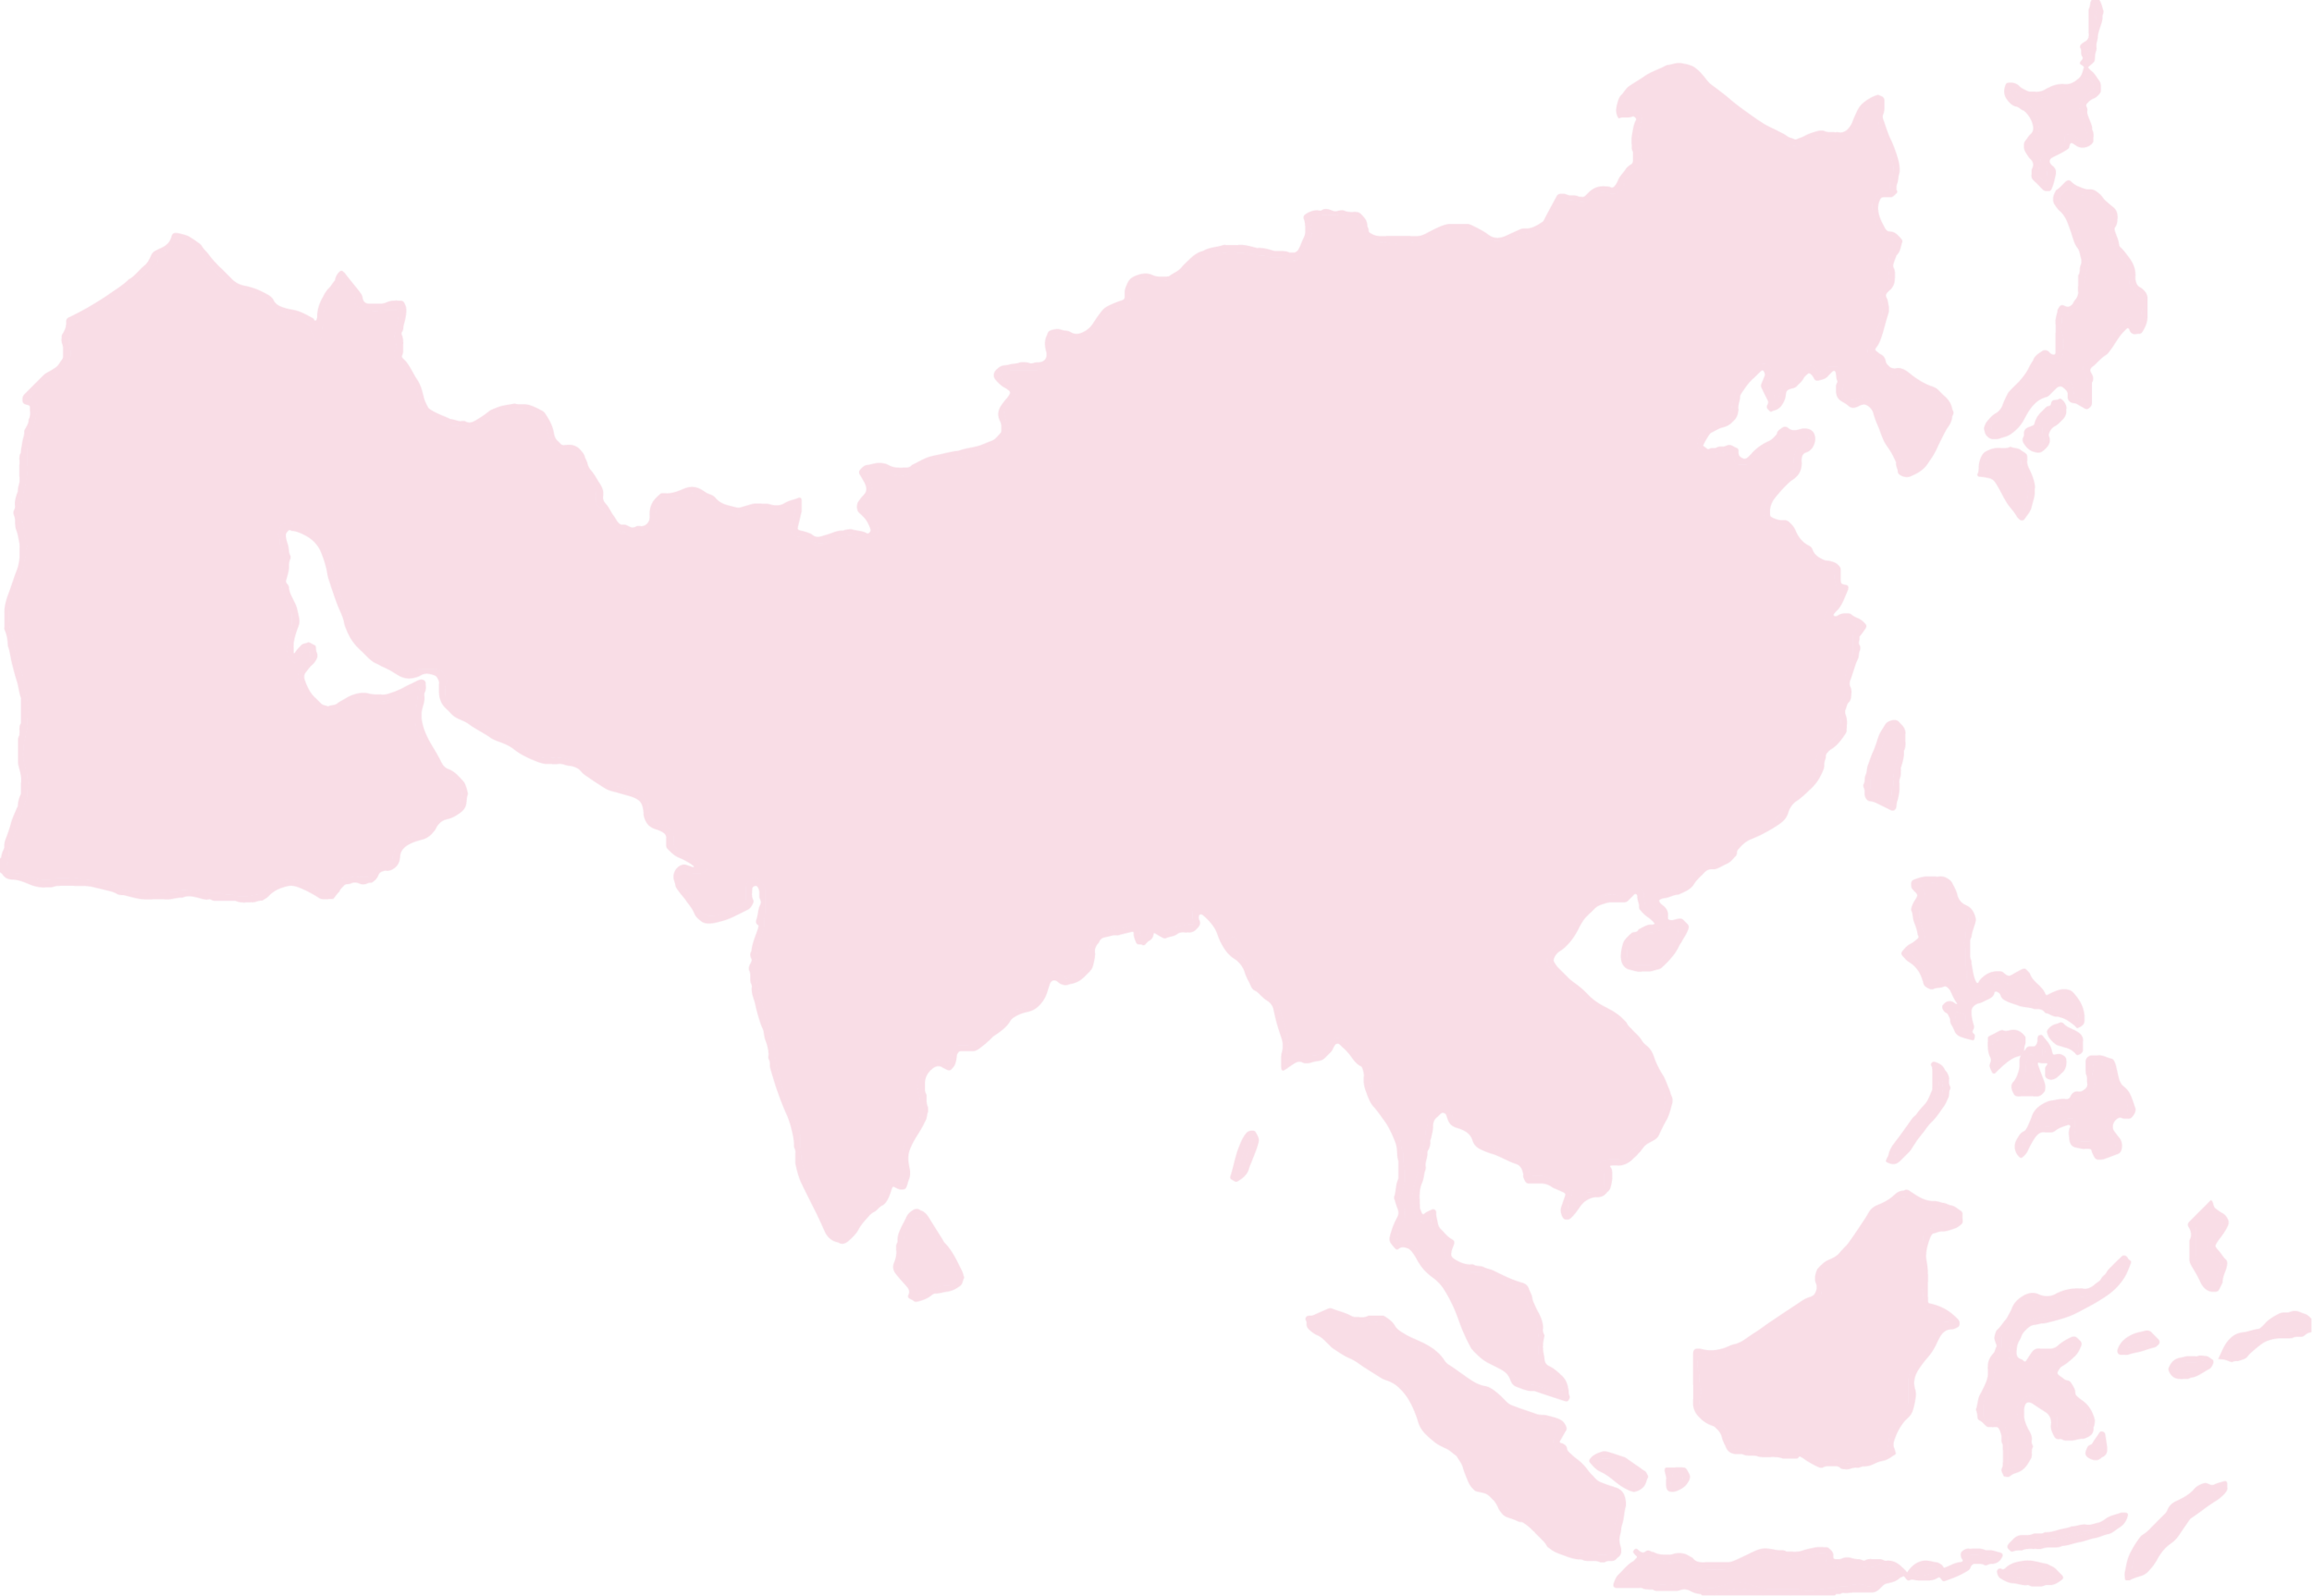 ILGA Asia is the Asian Region of the International Lesbian, Gay, Bisexual, Trans and Intersex Association (ILGA).